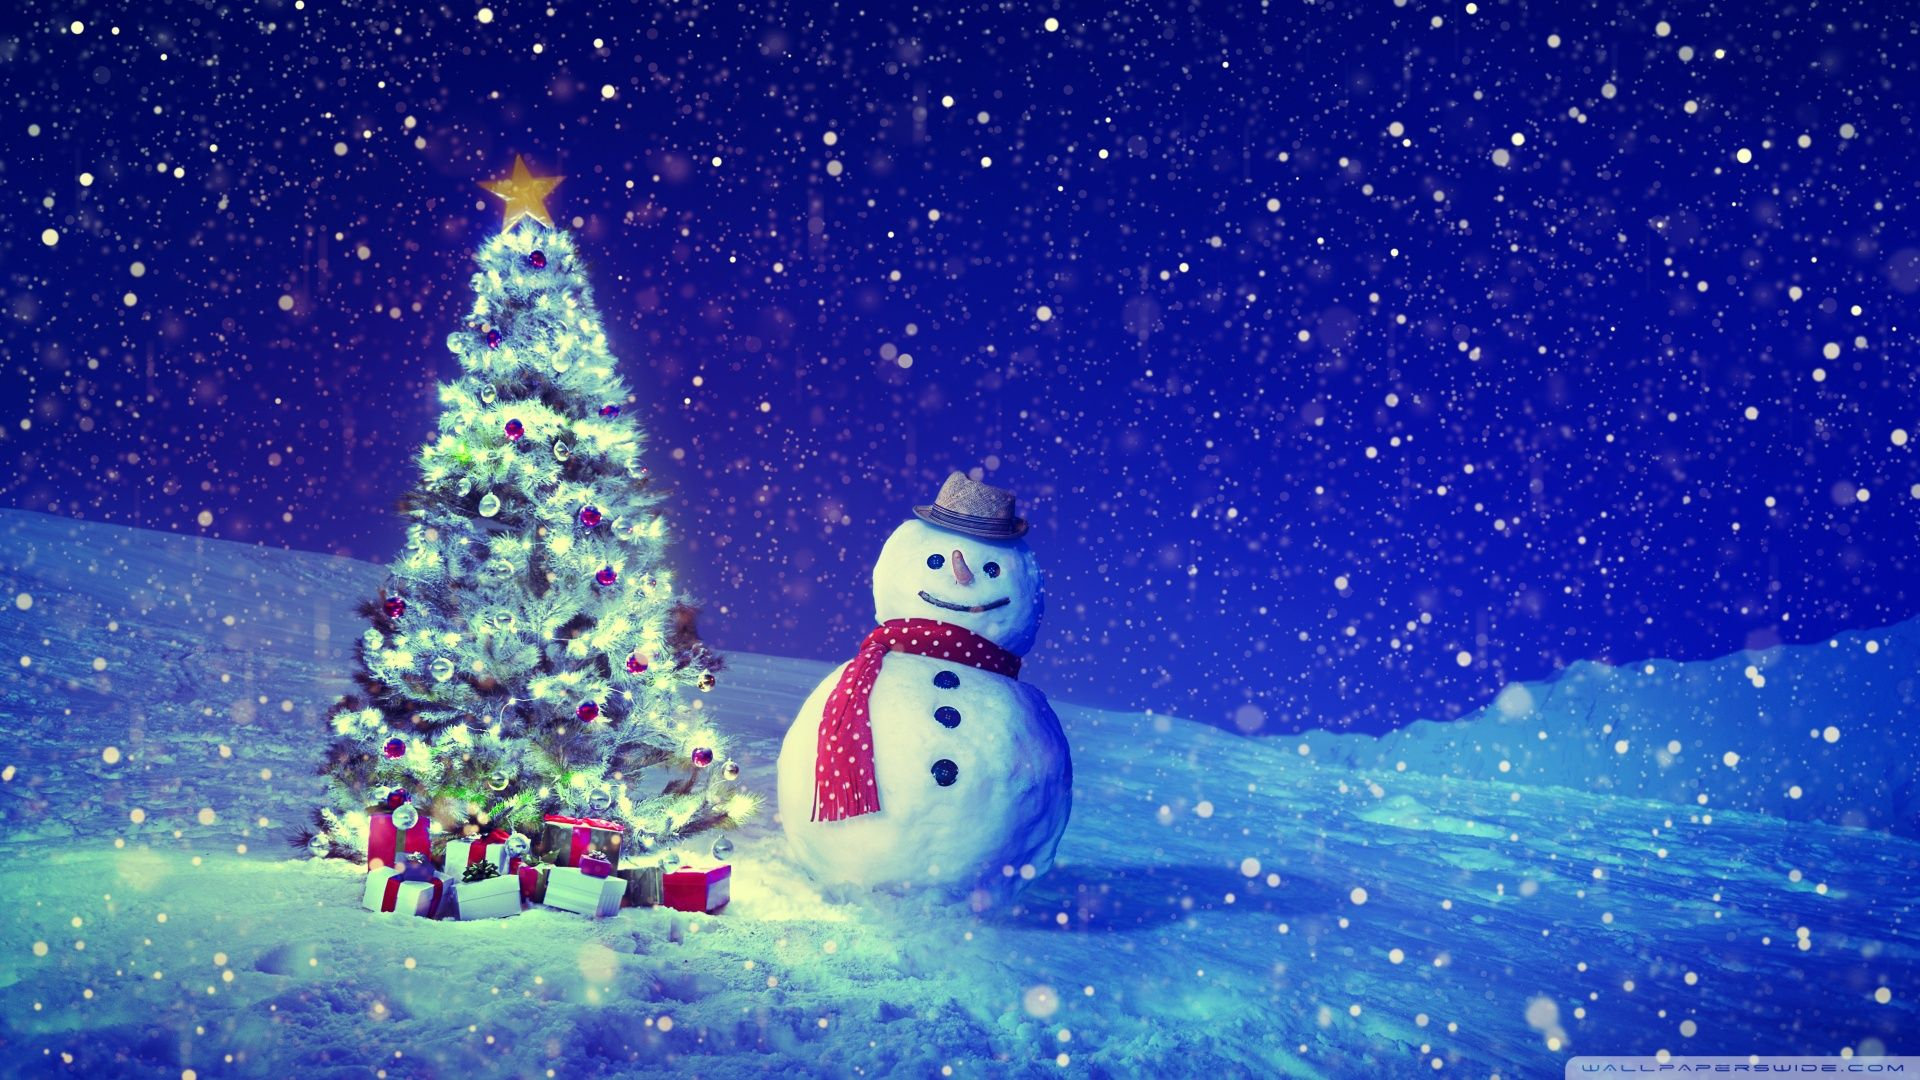 Christmas Tree Snowman Winter Landscape